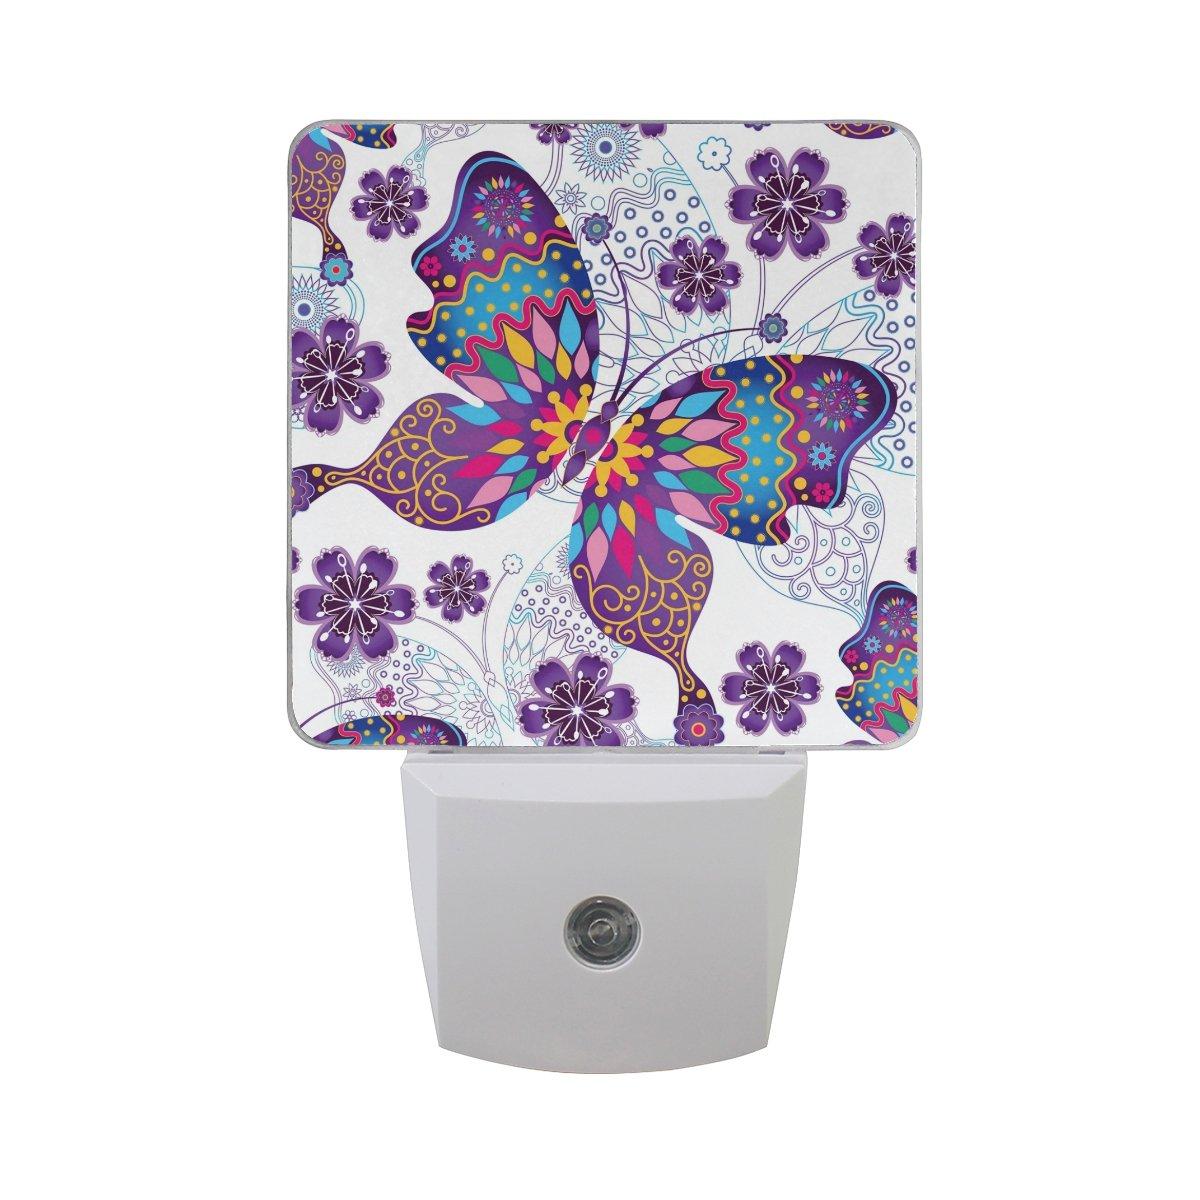 JOYPRINT Led Night Light Summer Animal Butterfly Floral Mandala, Auto Senor Dusk to Dawn Night Light Plug in for Kids Baby Girls Boys Adults Room